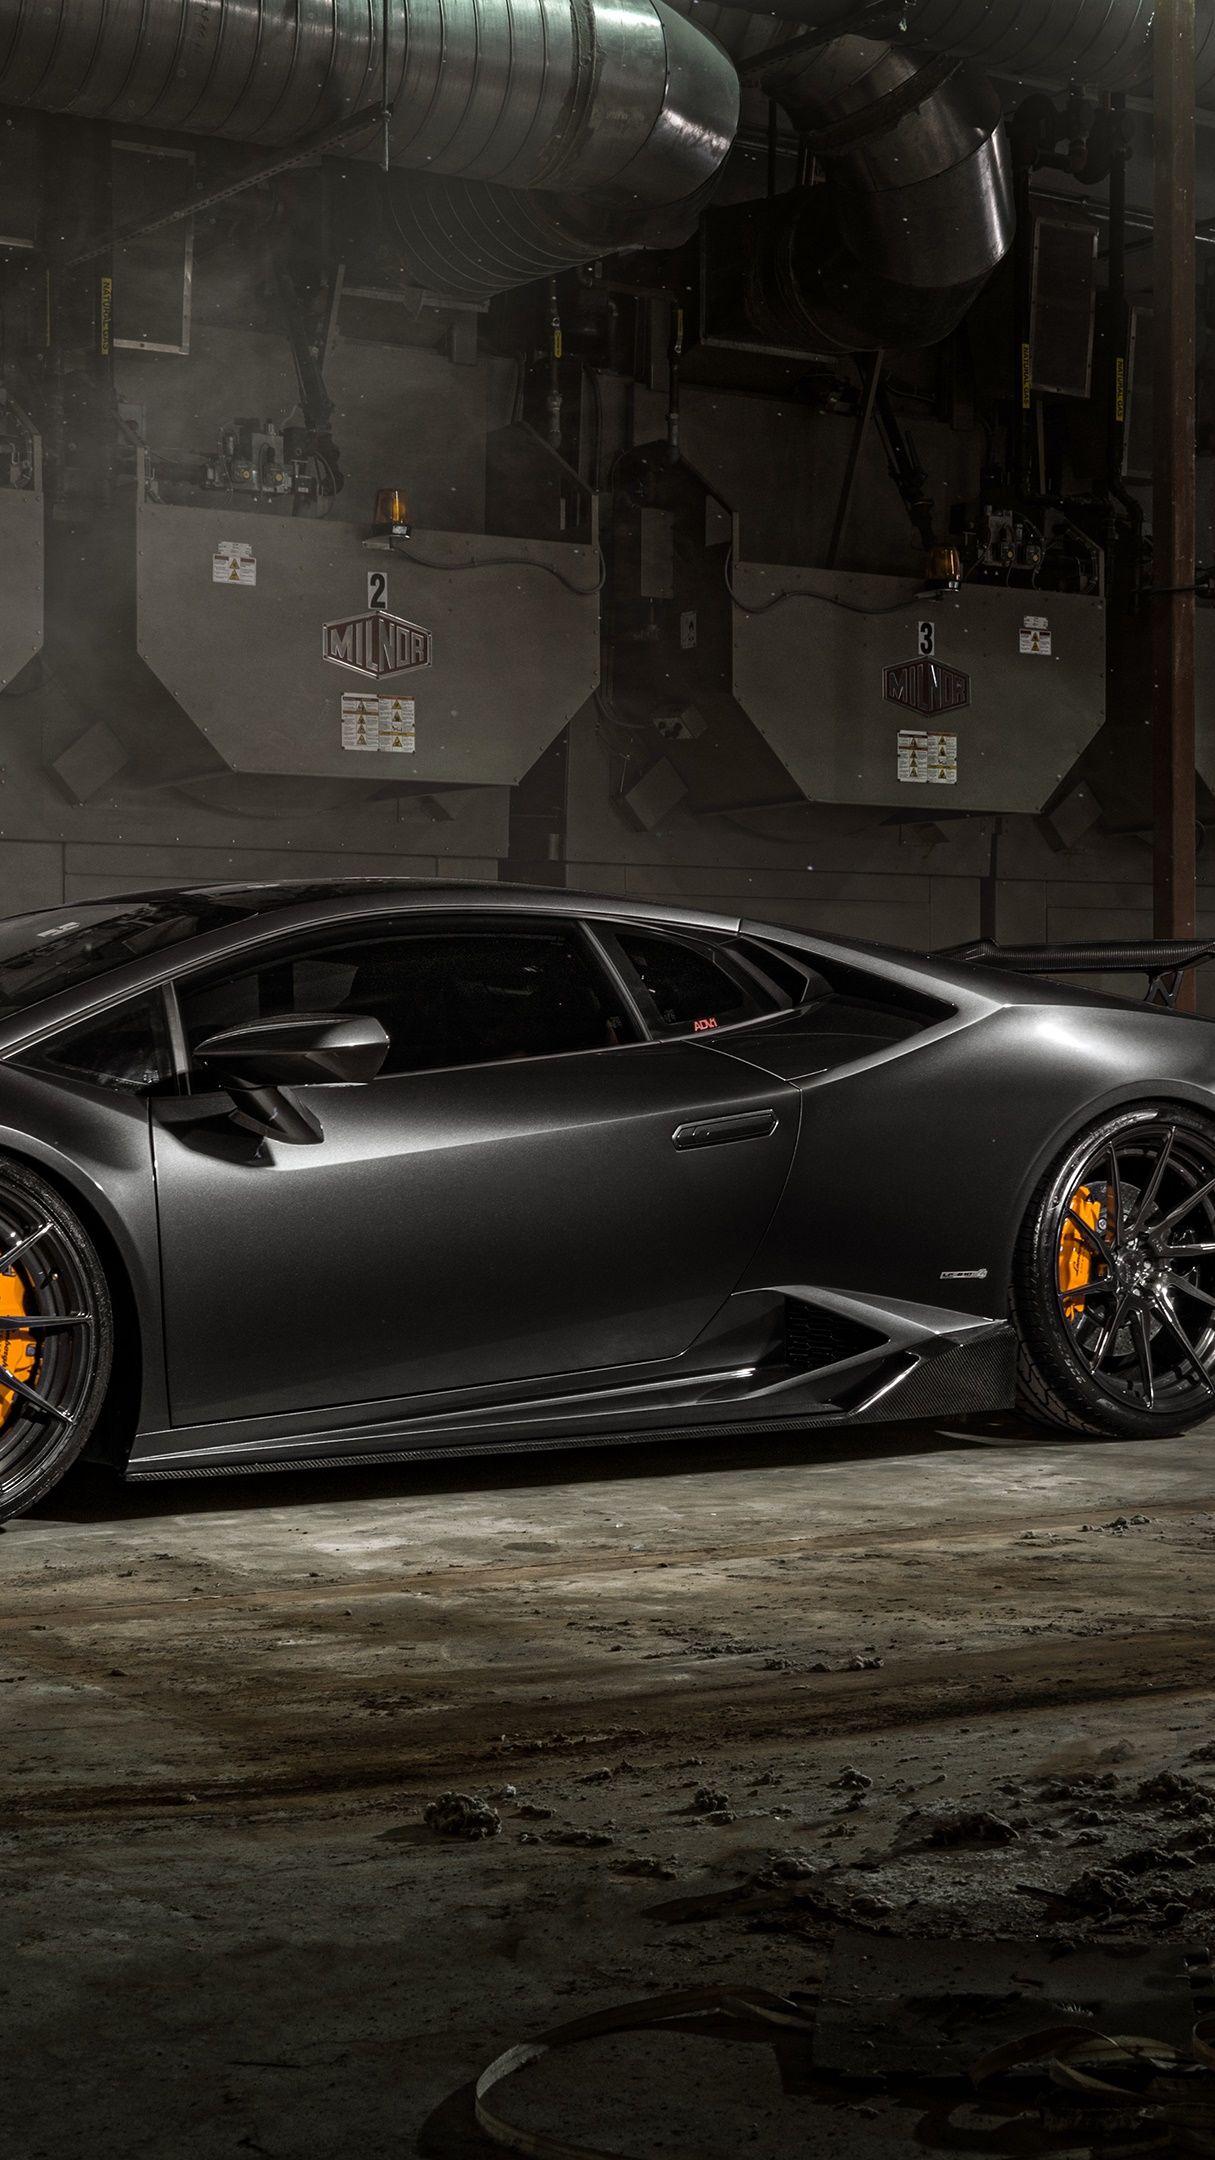 Black Lamborghini Huracan wallpaper - backiee